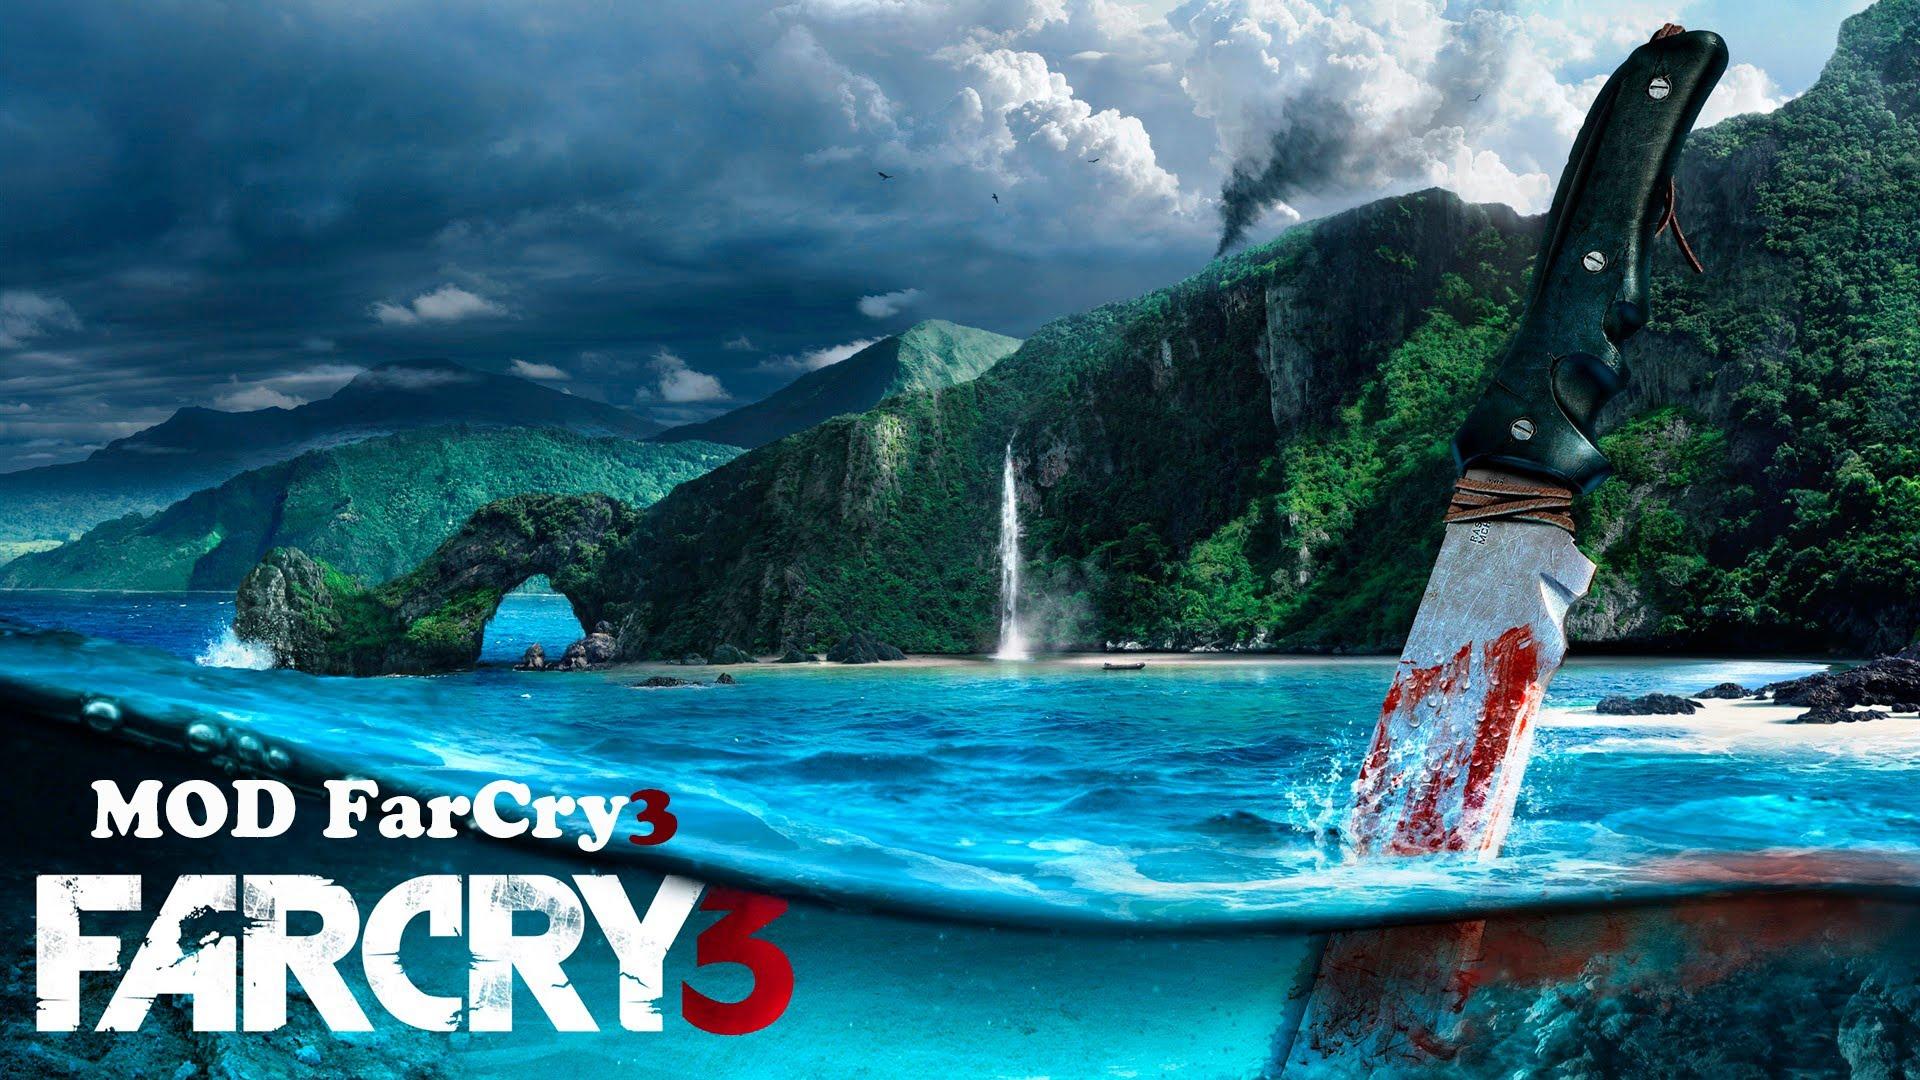 Farcry New Dawn Hd Wallpaper Download For Windows 10: Predaaator's Far Cry 4 Editor Mod V1.0 File